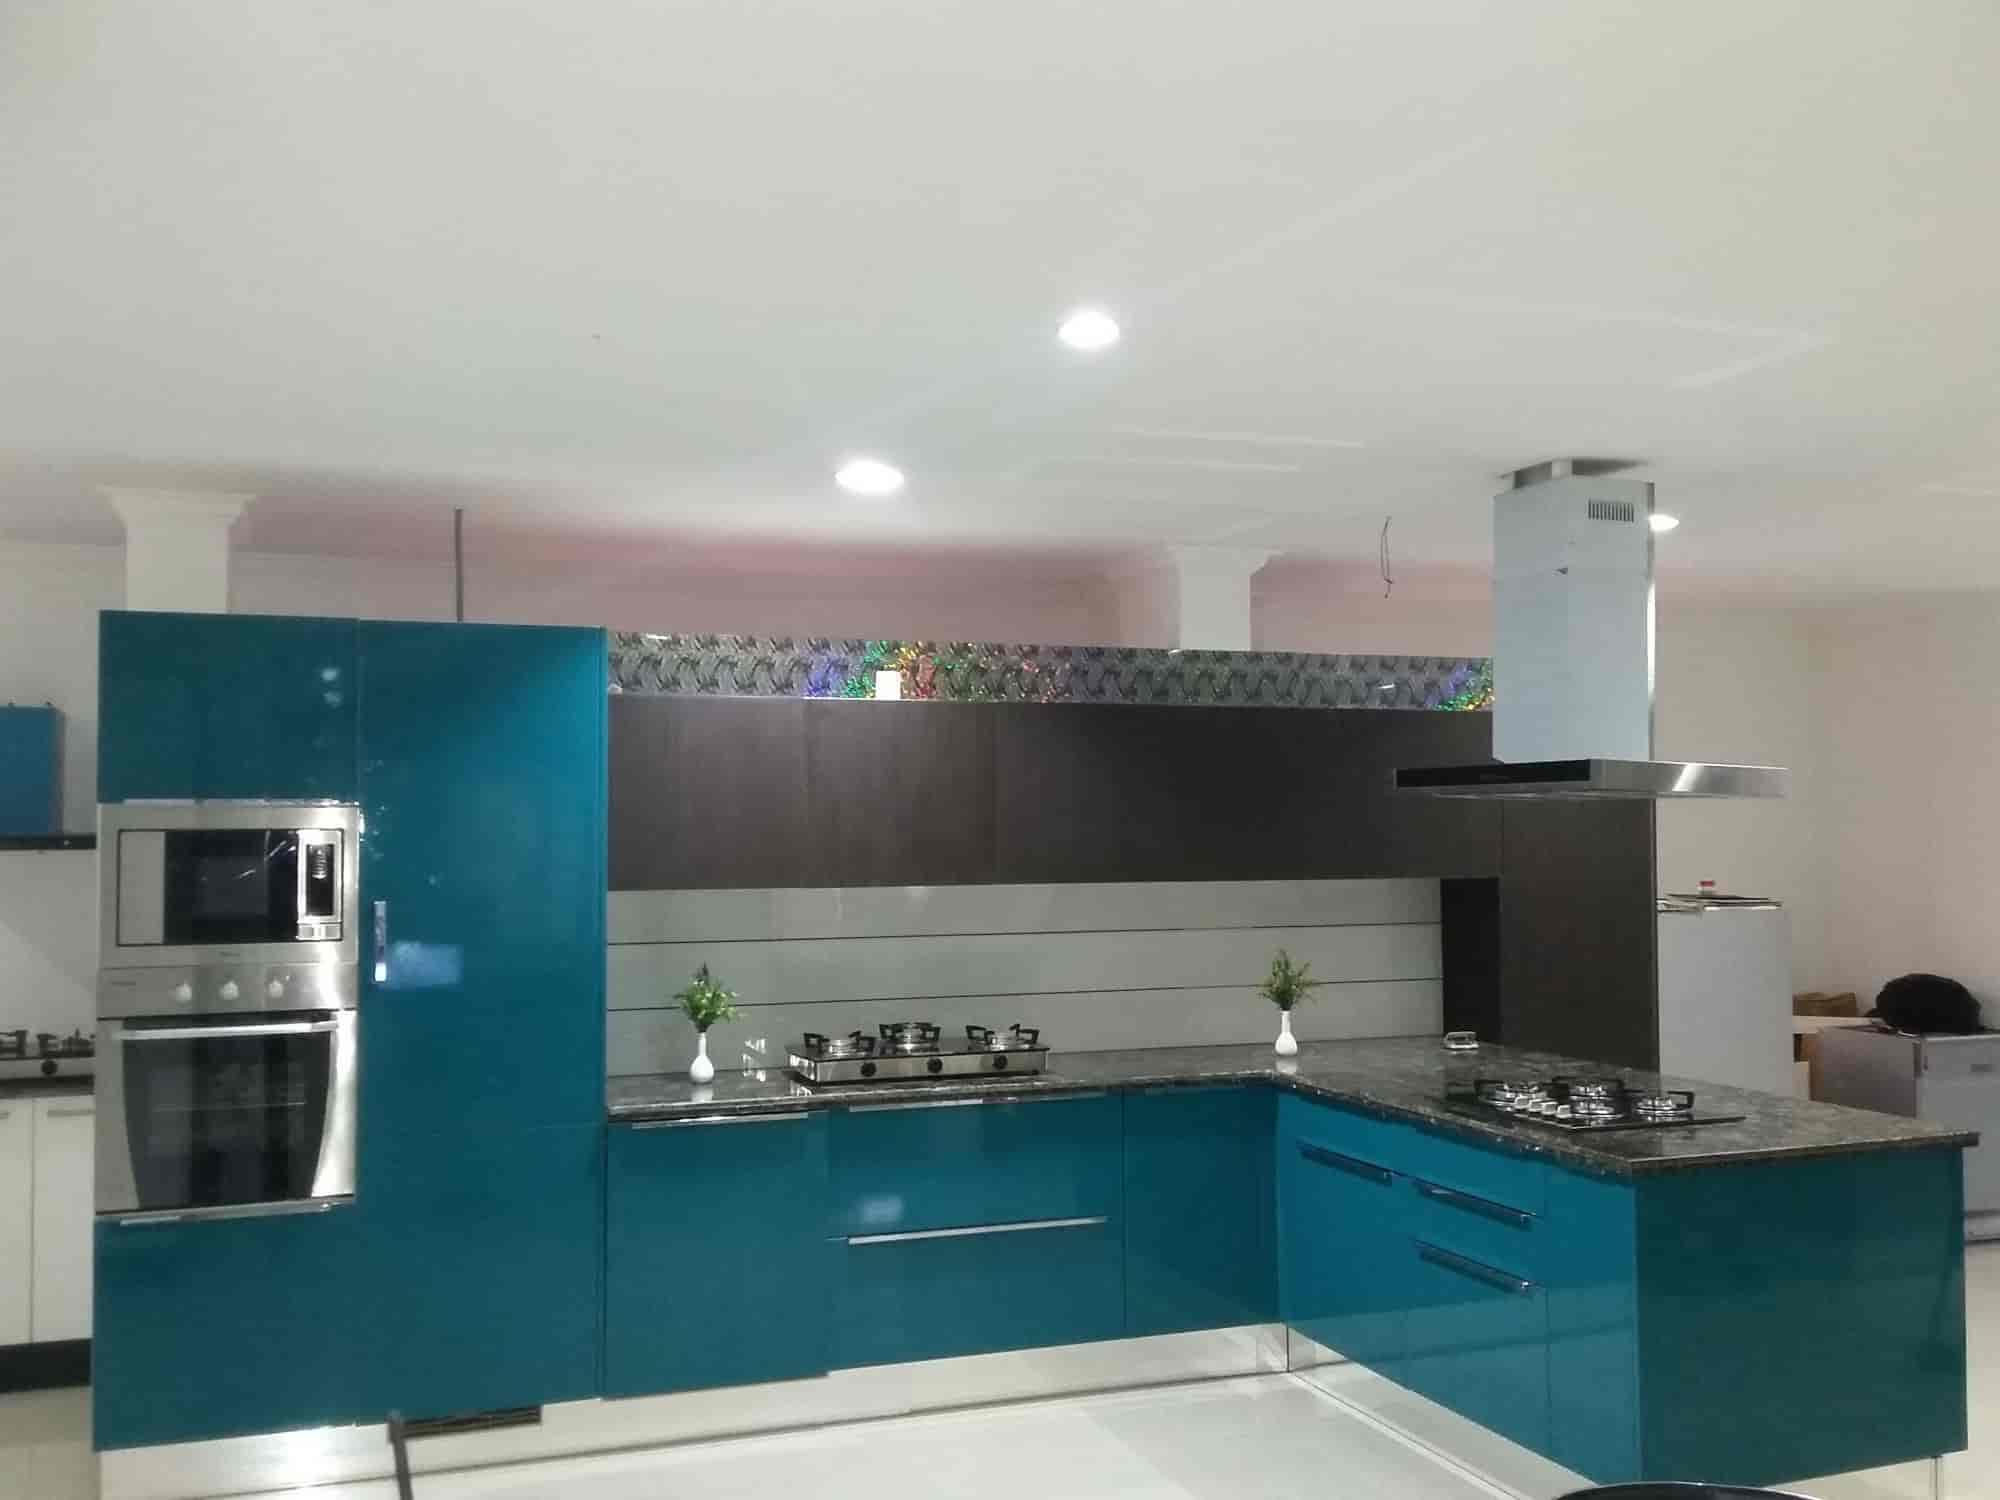 Lovely ABC Sleek Kitchen Agencies, Karunagappaly   Interior Designers In Kollam    Justdial